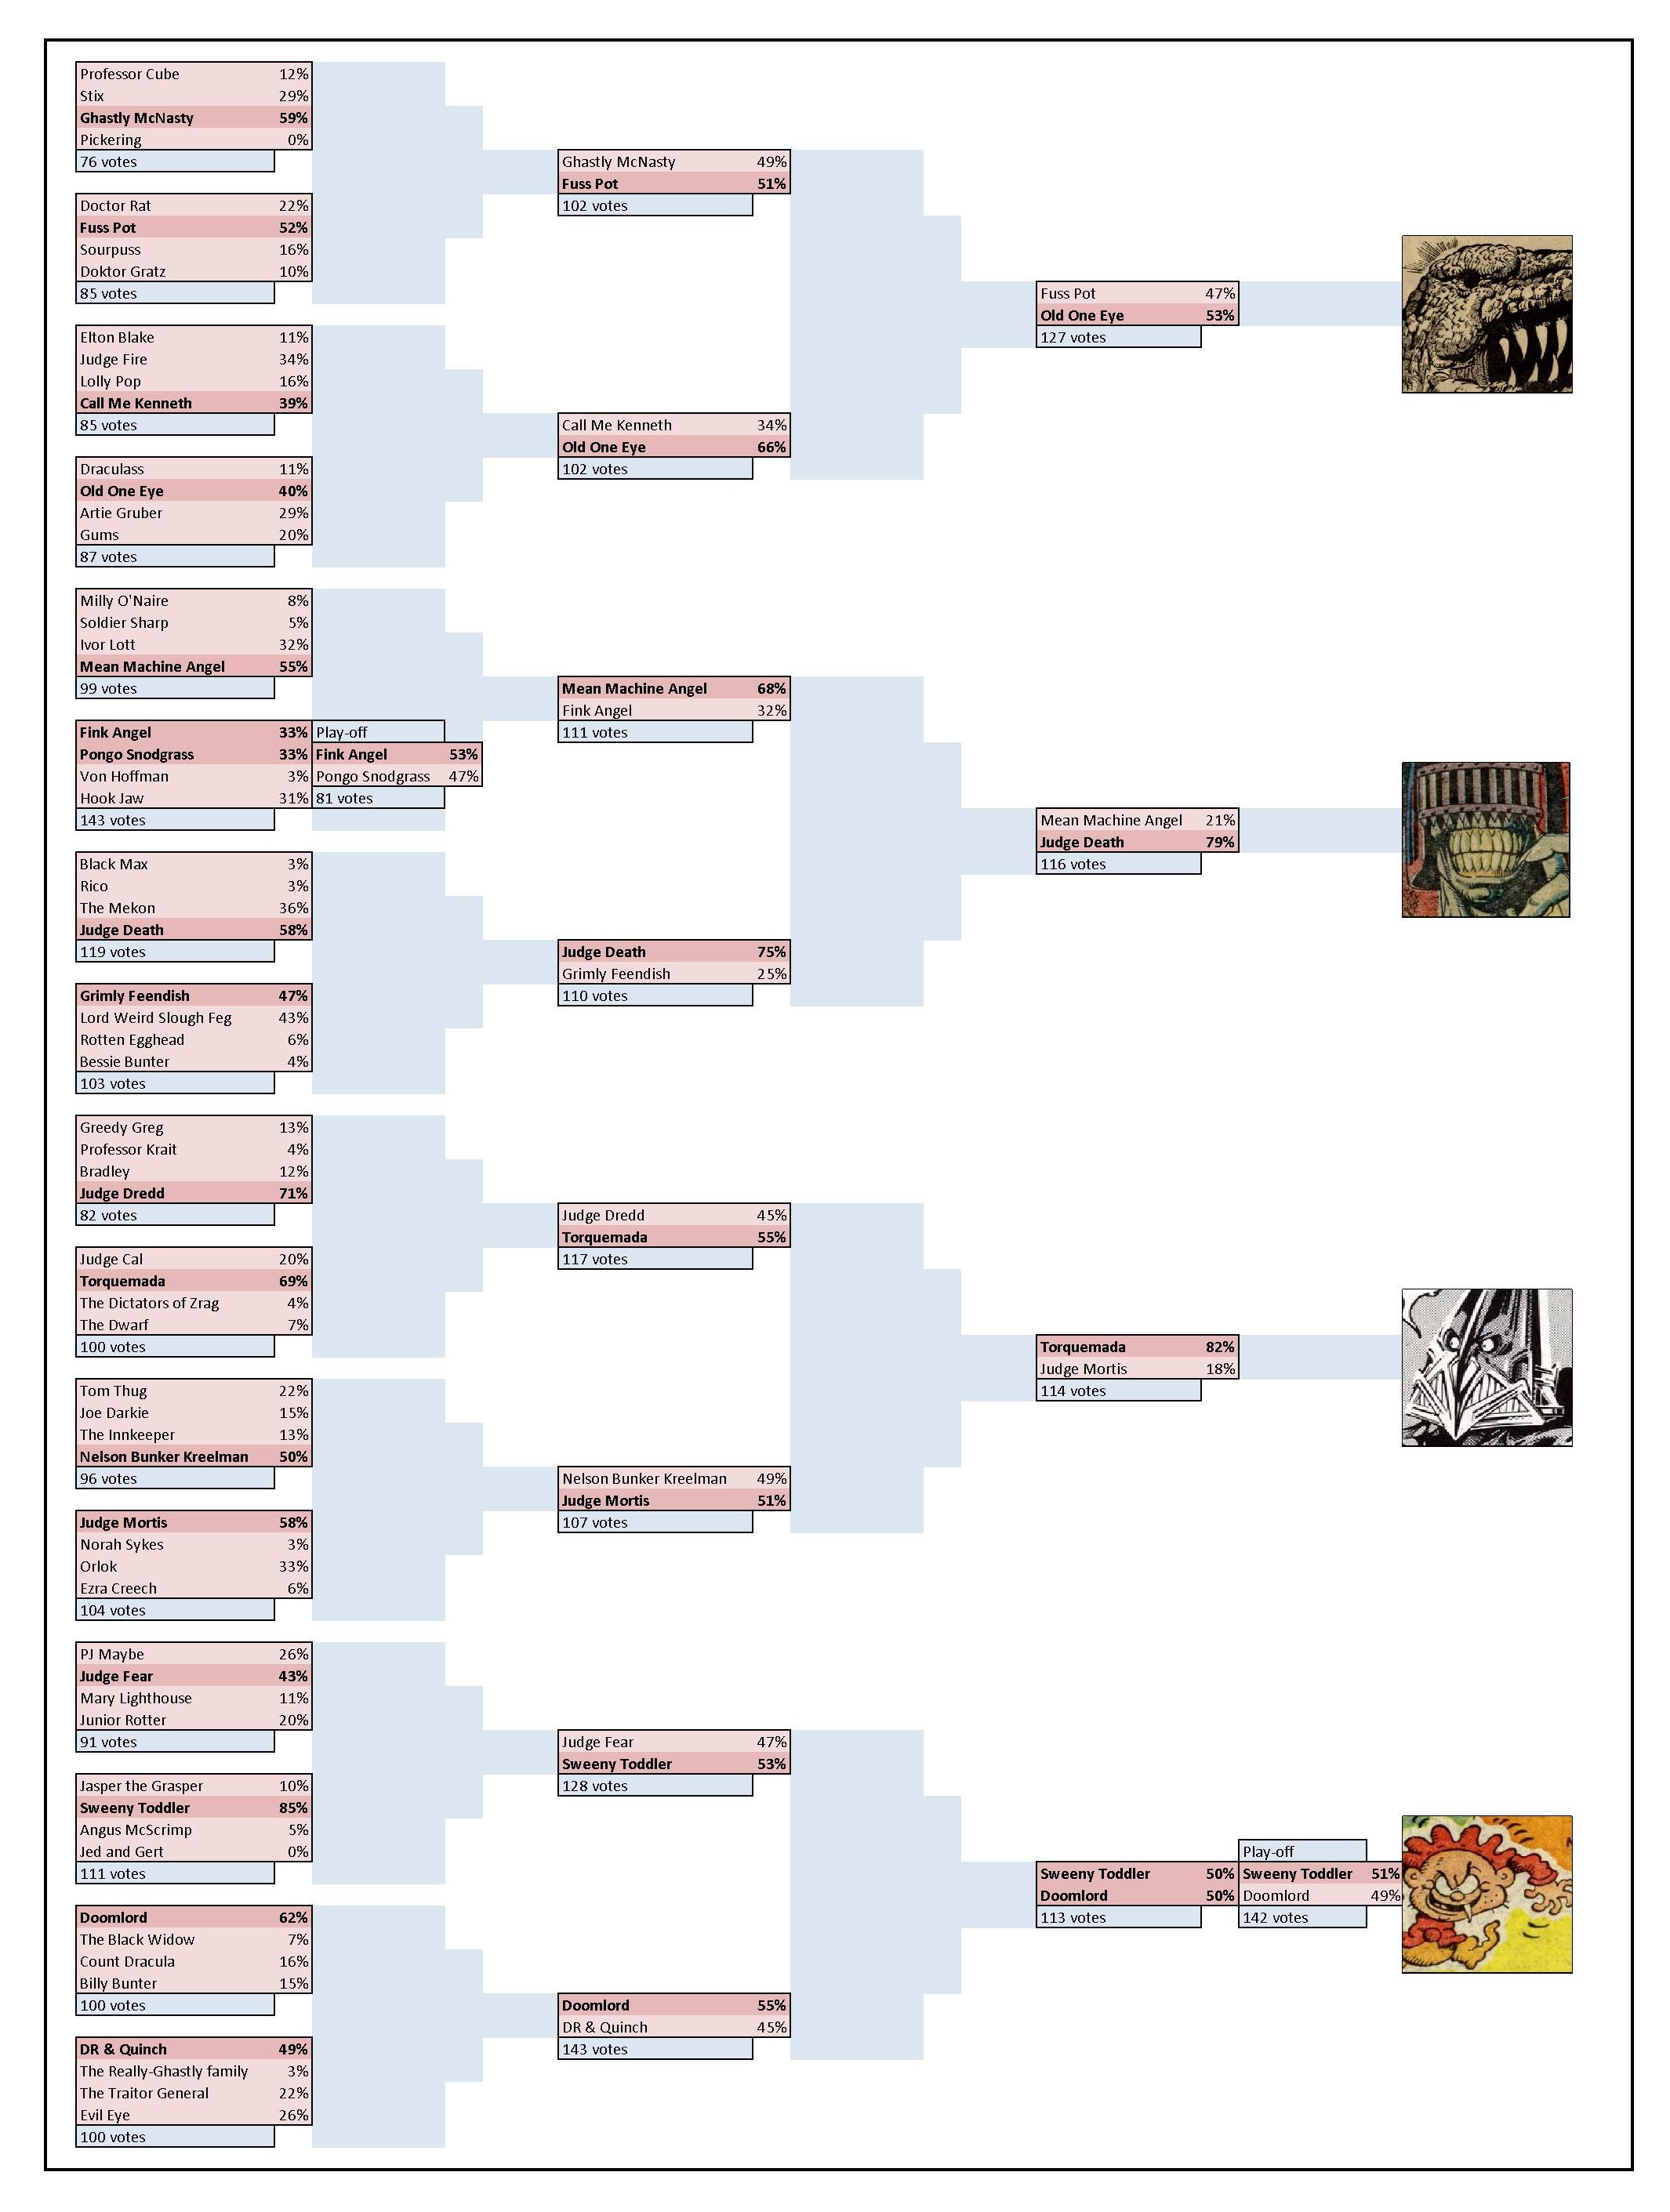 World Cup of Baddies tournament.jpg